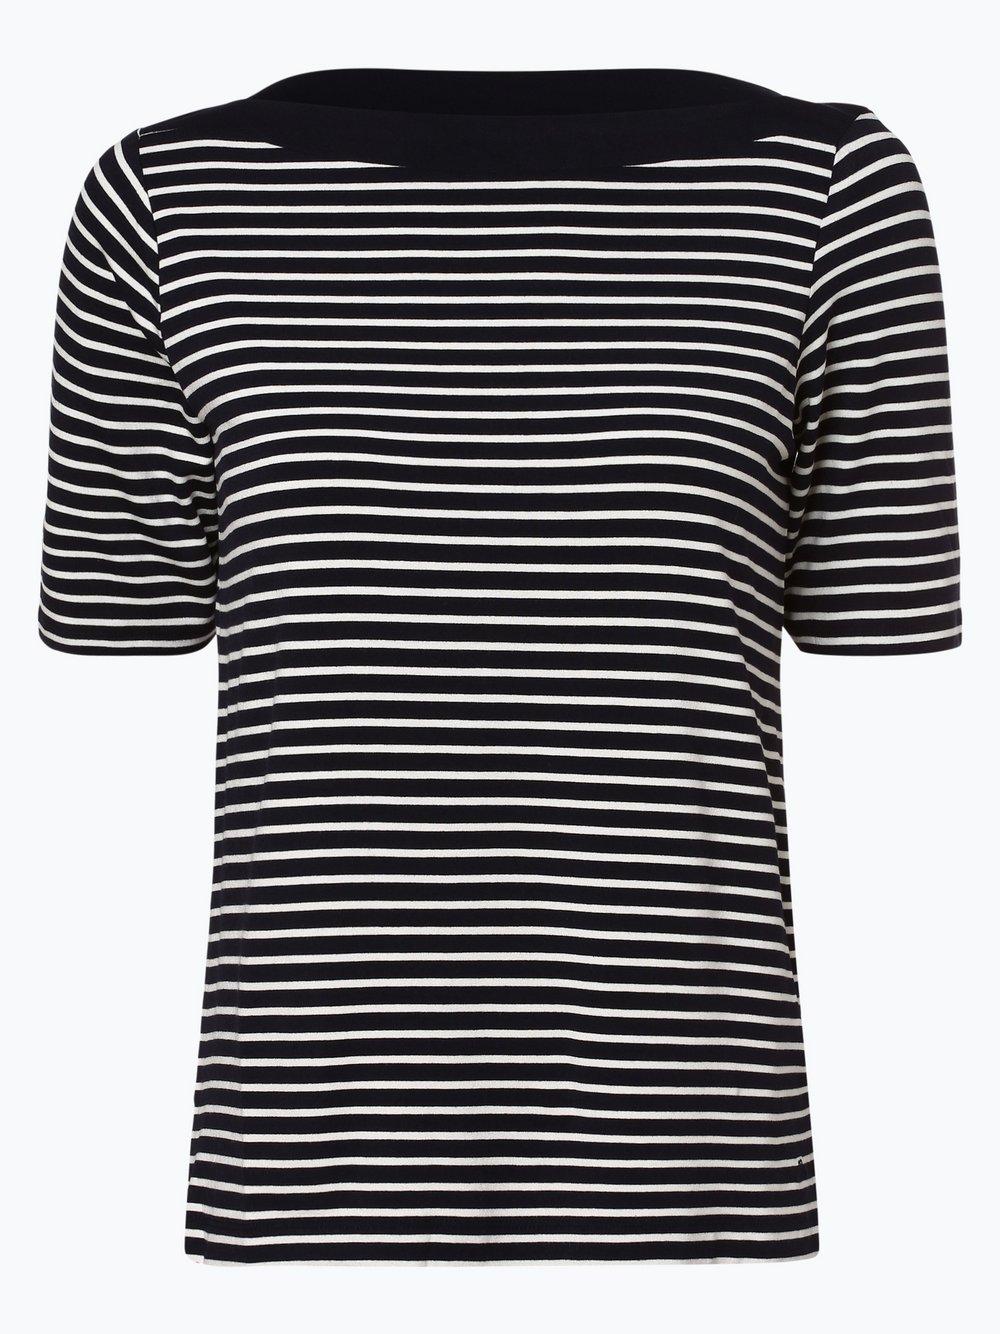 s.Oliver - T-shirt damski, niebieski